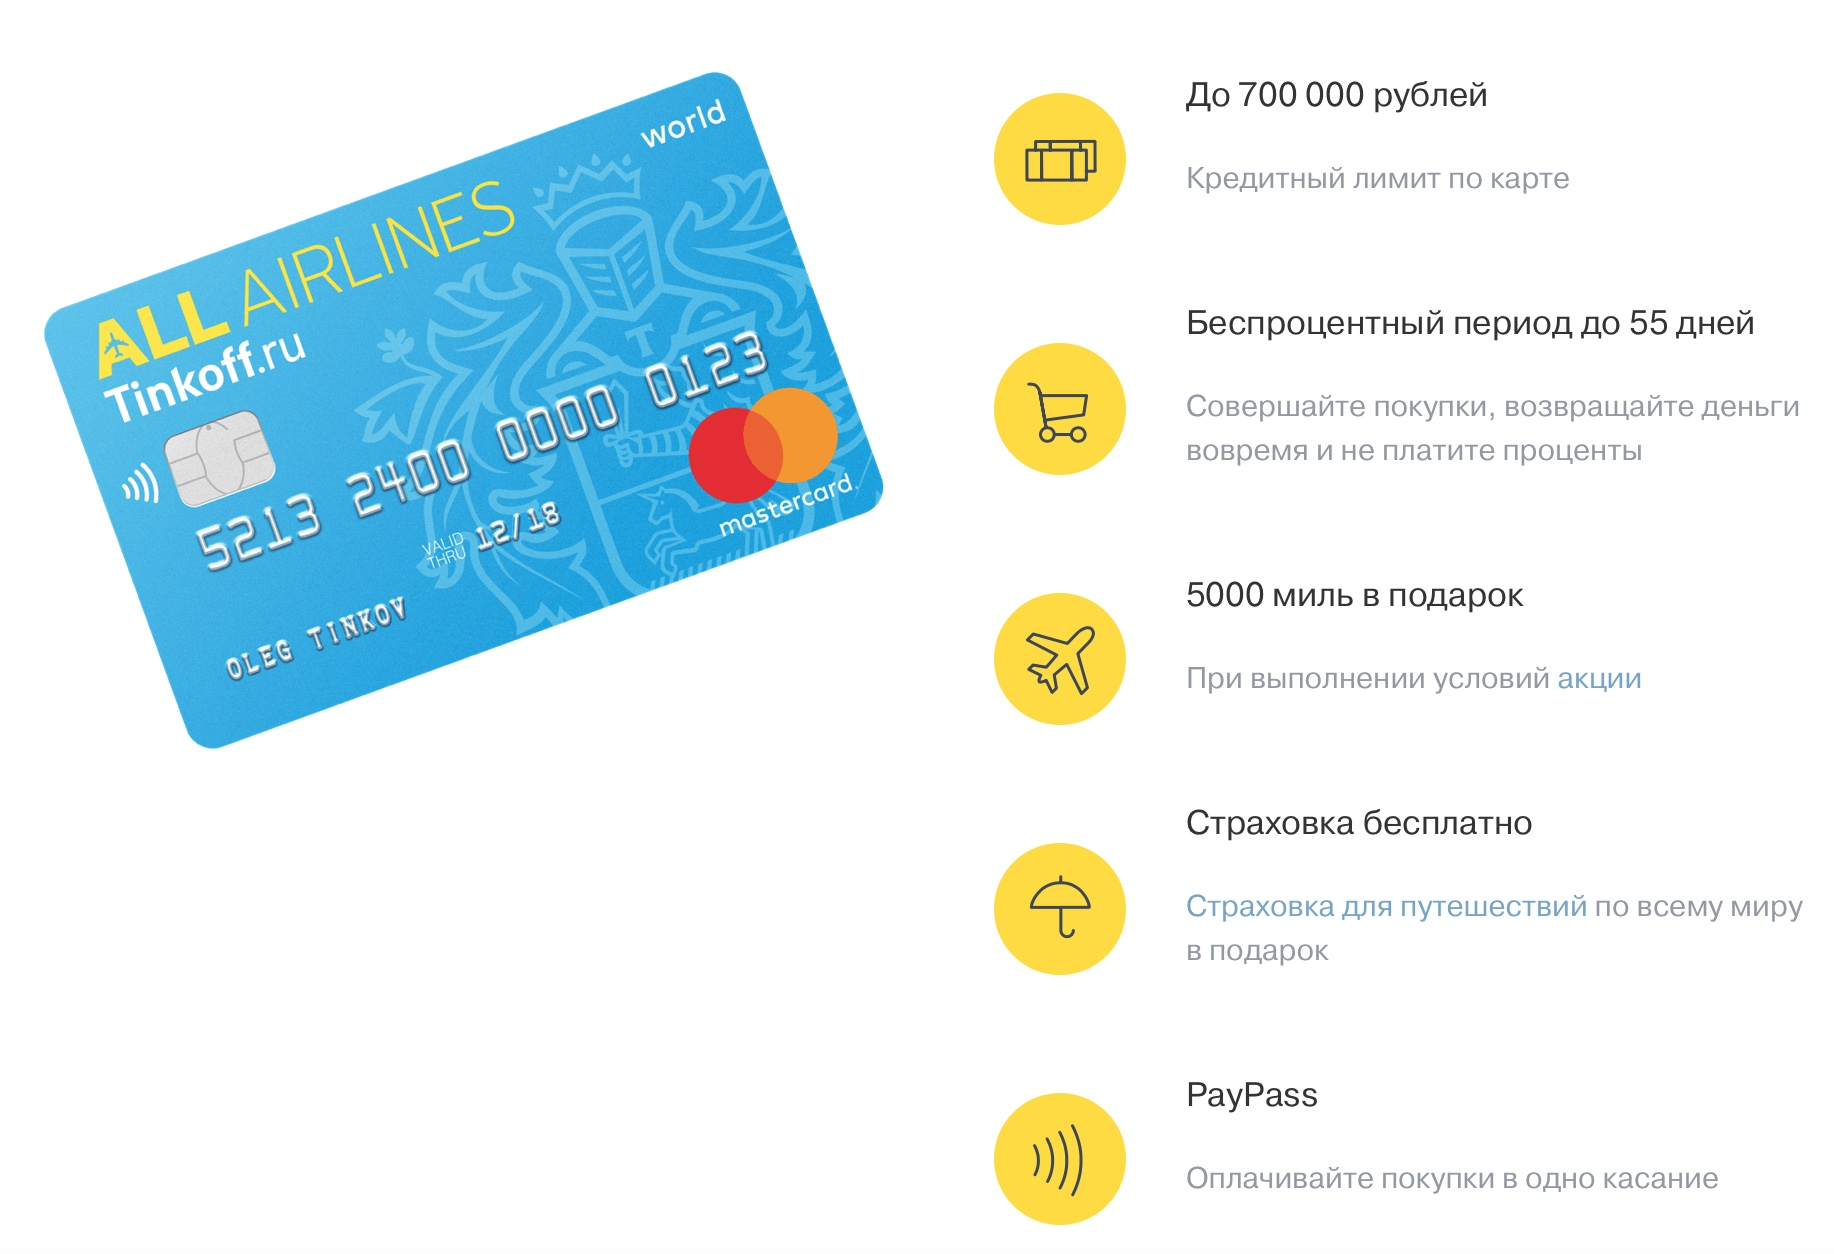 Кредитная карта All Airlines от Тинькофф банка - условия, тарифы, кэшбэк